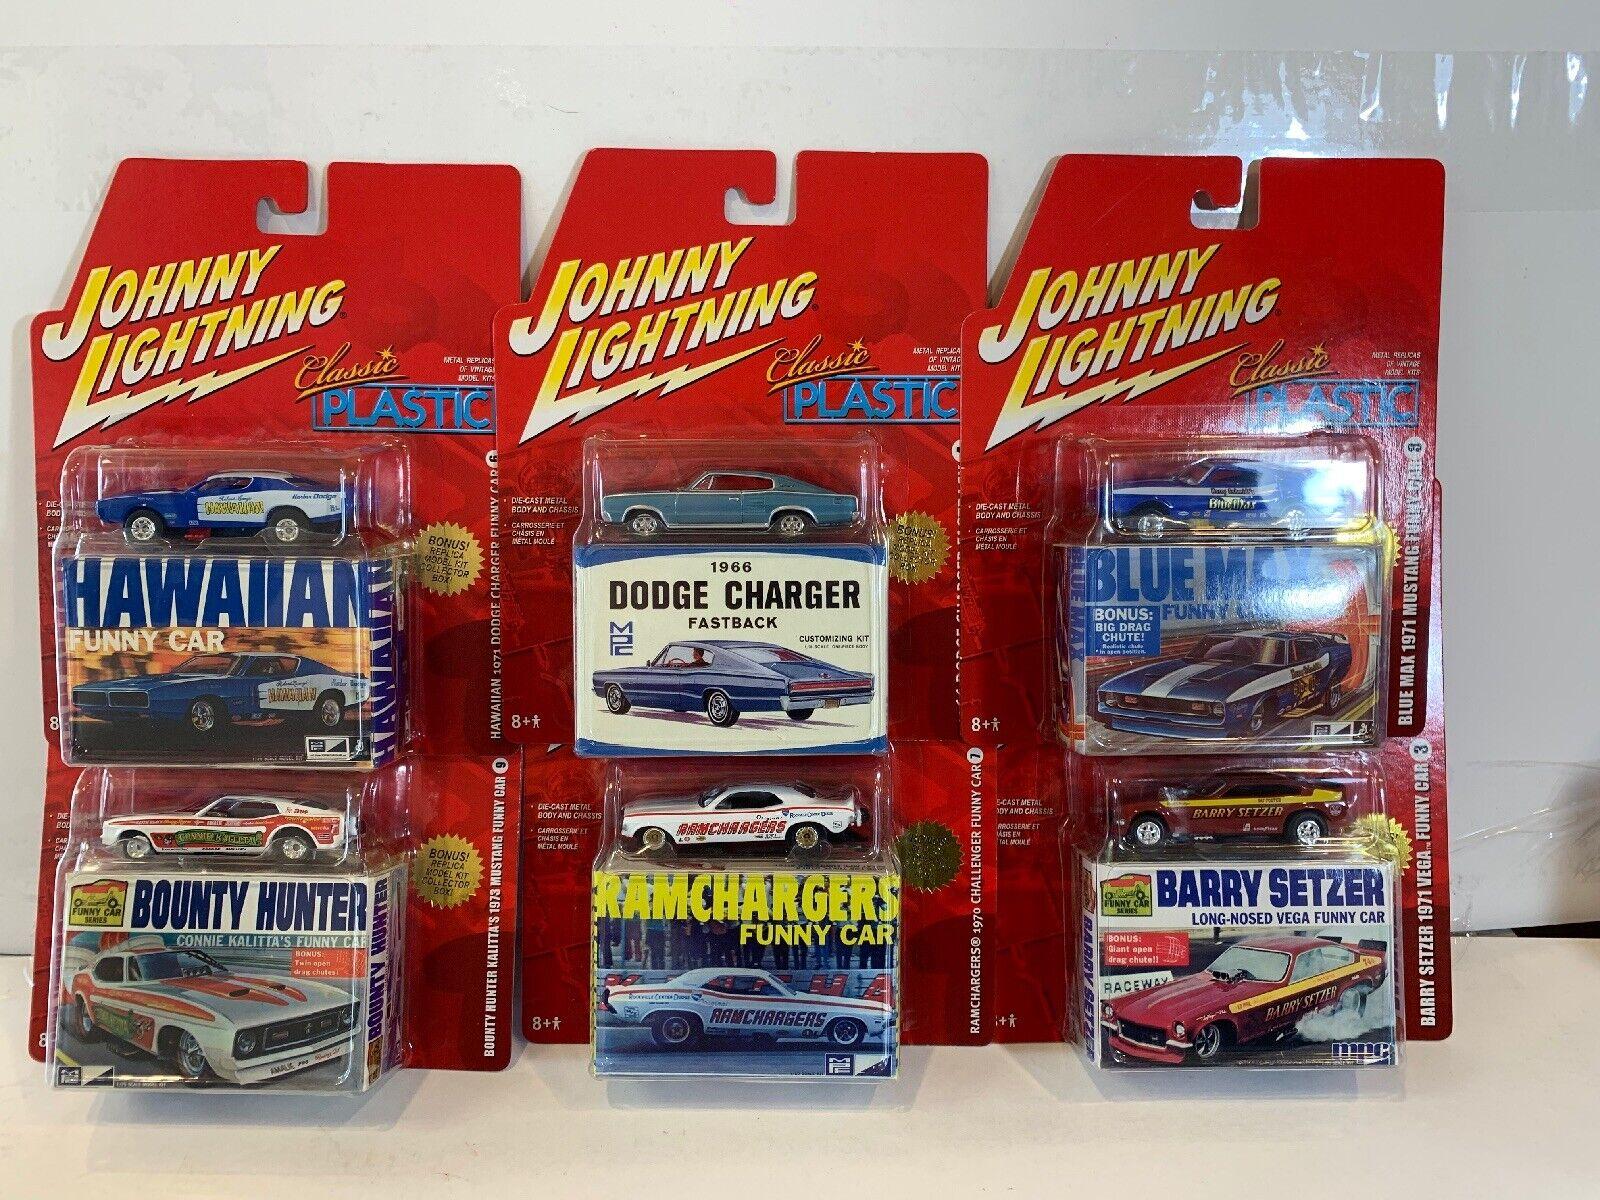 Lot Of 6 New Sealed JOHNNY LIGHTNING CLASSIC PLASTIC Dies Cast Cars